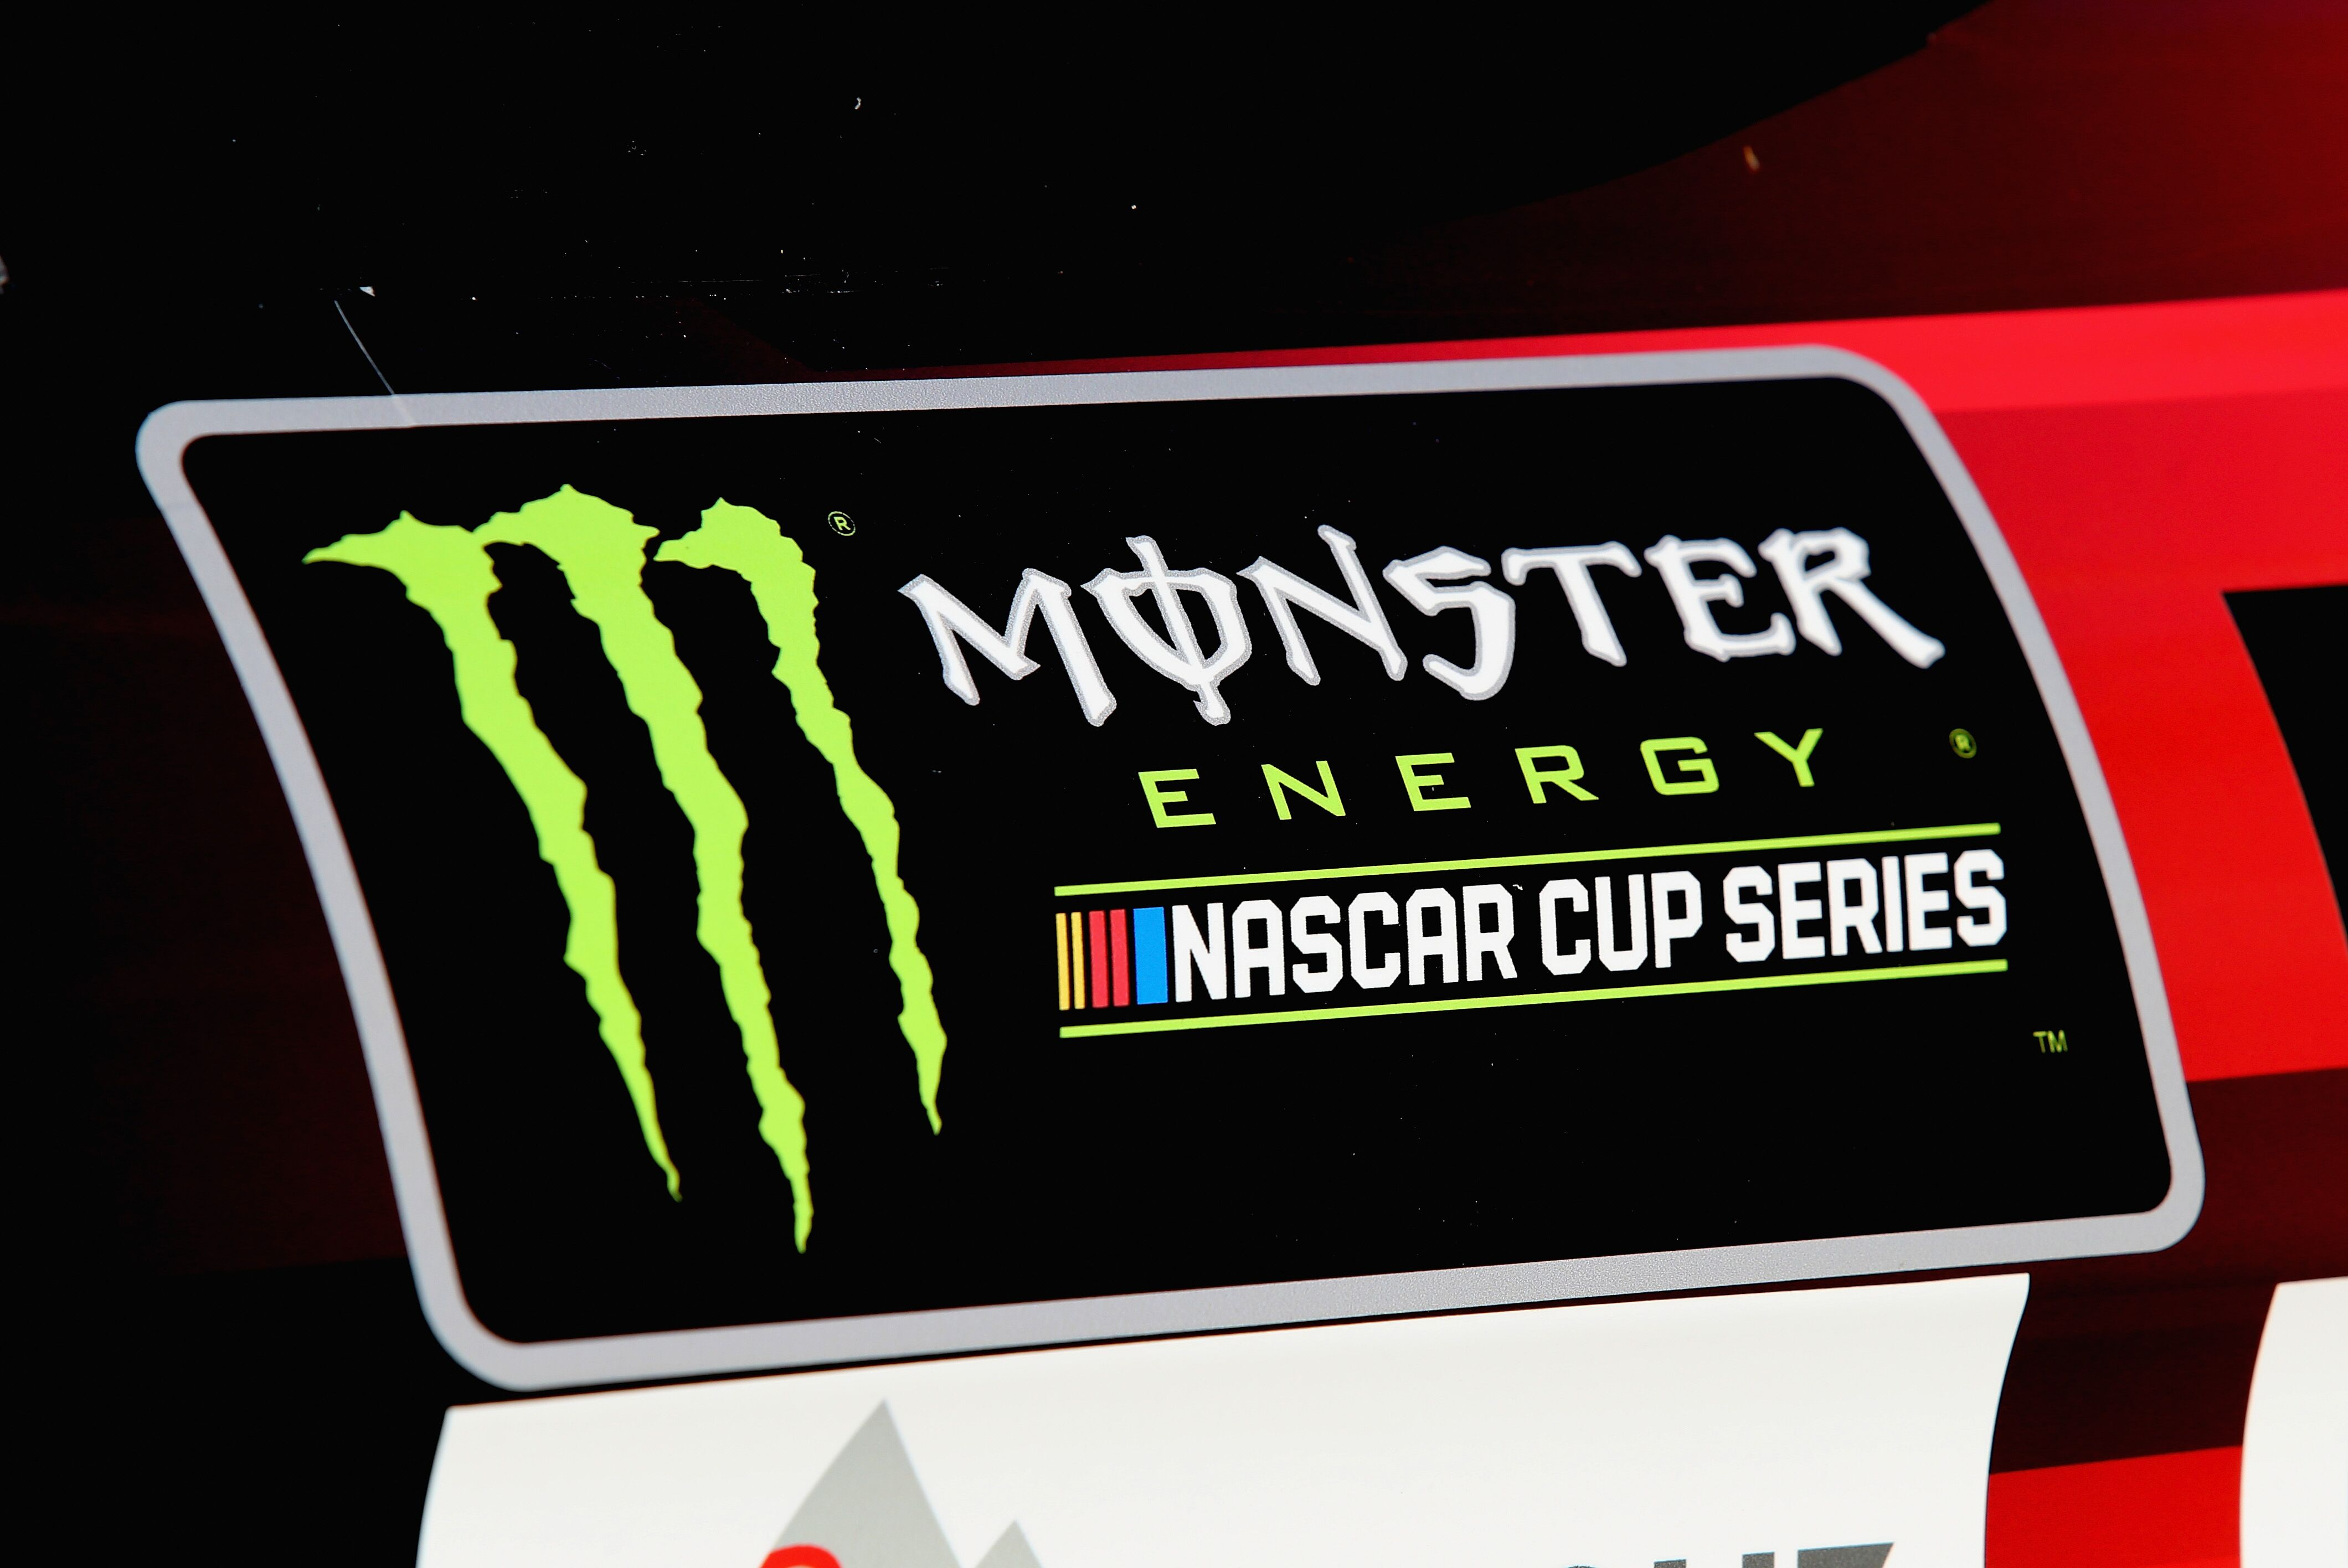 NASCAR, Monster Energy update: Talks ongoing, optimism on deal